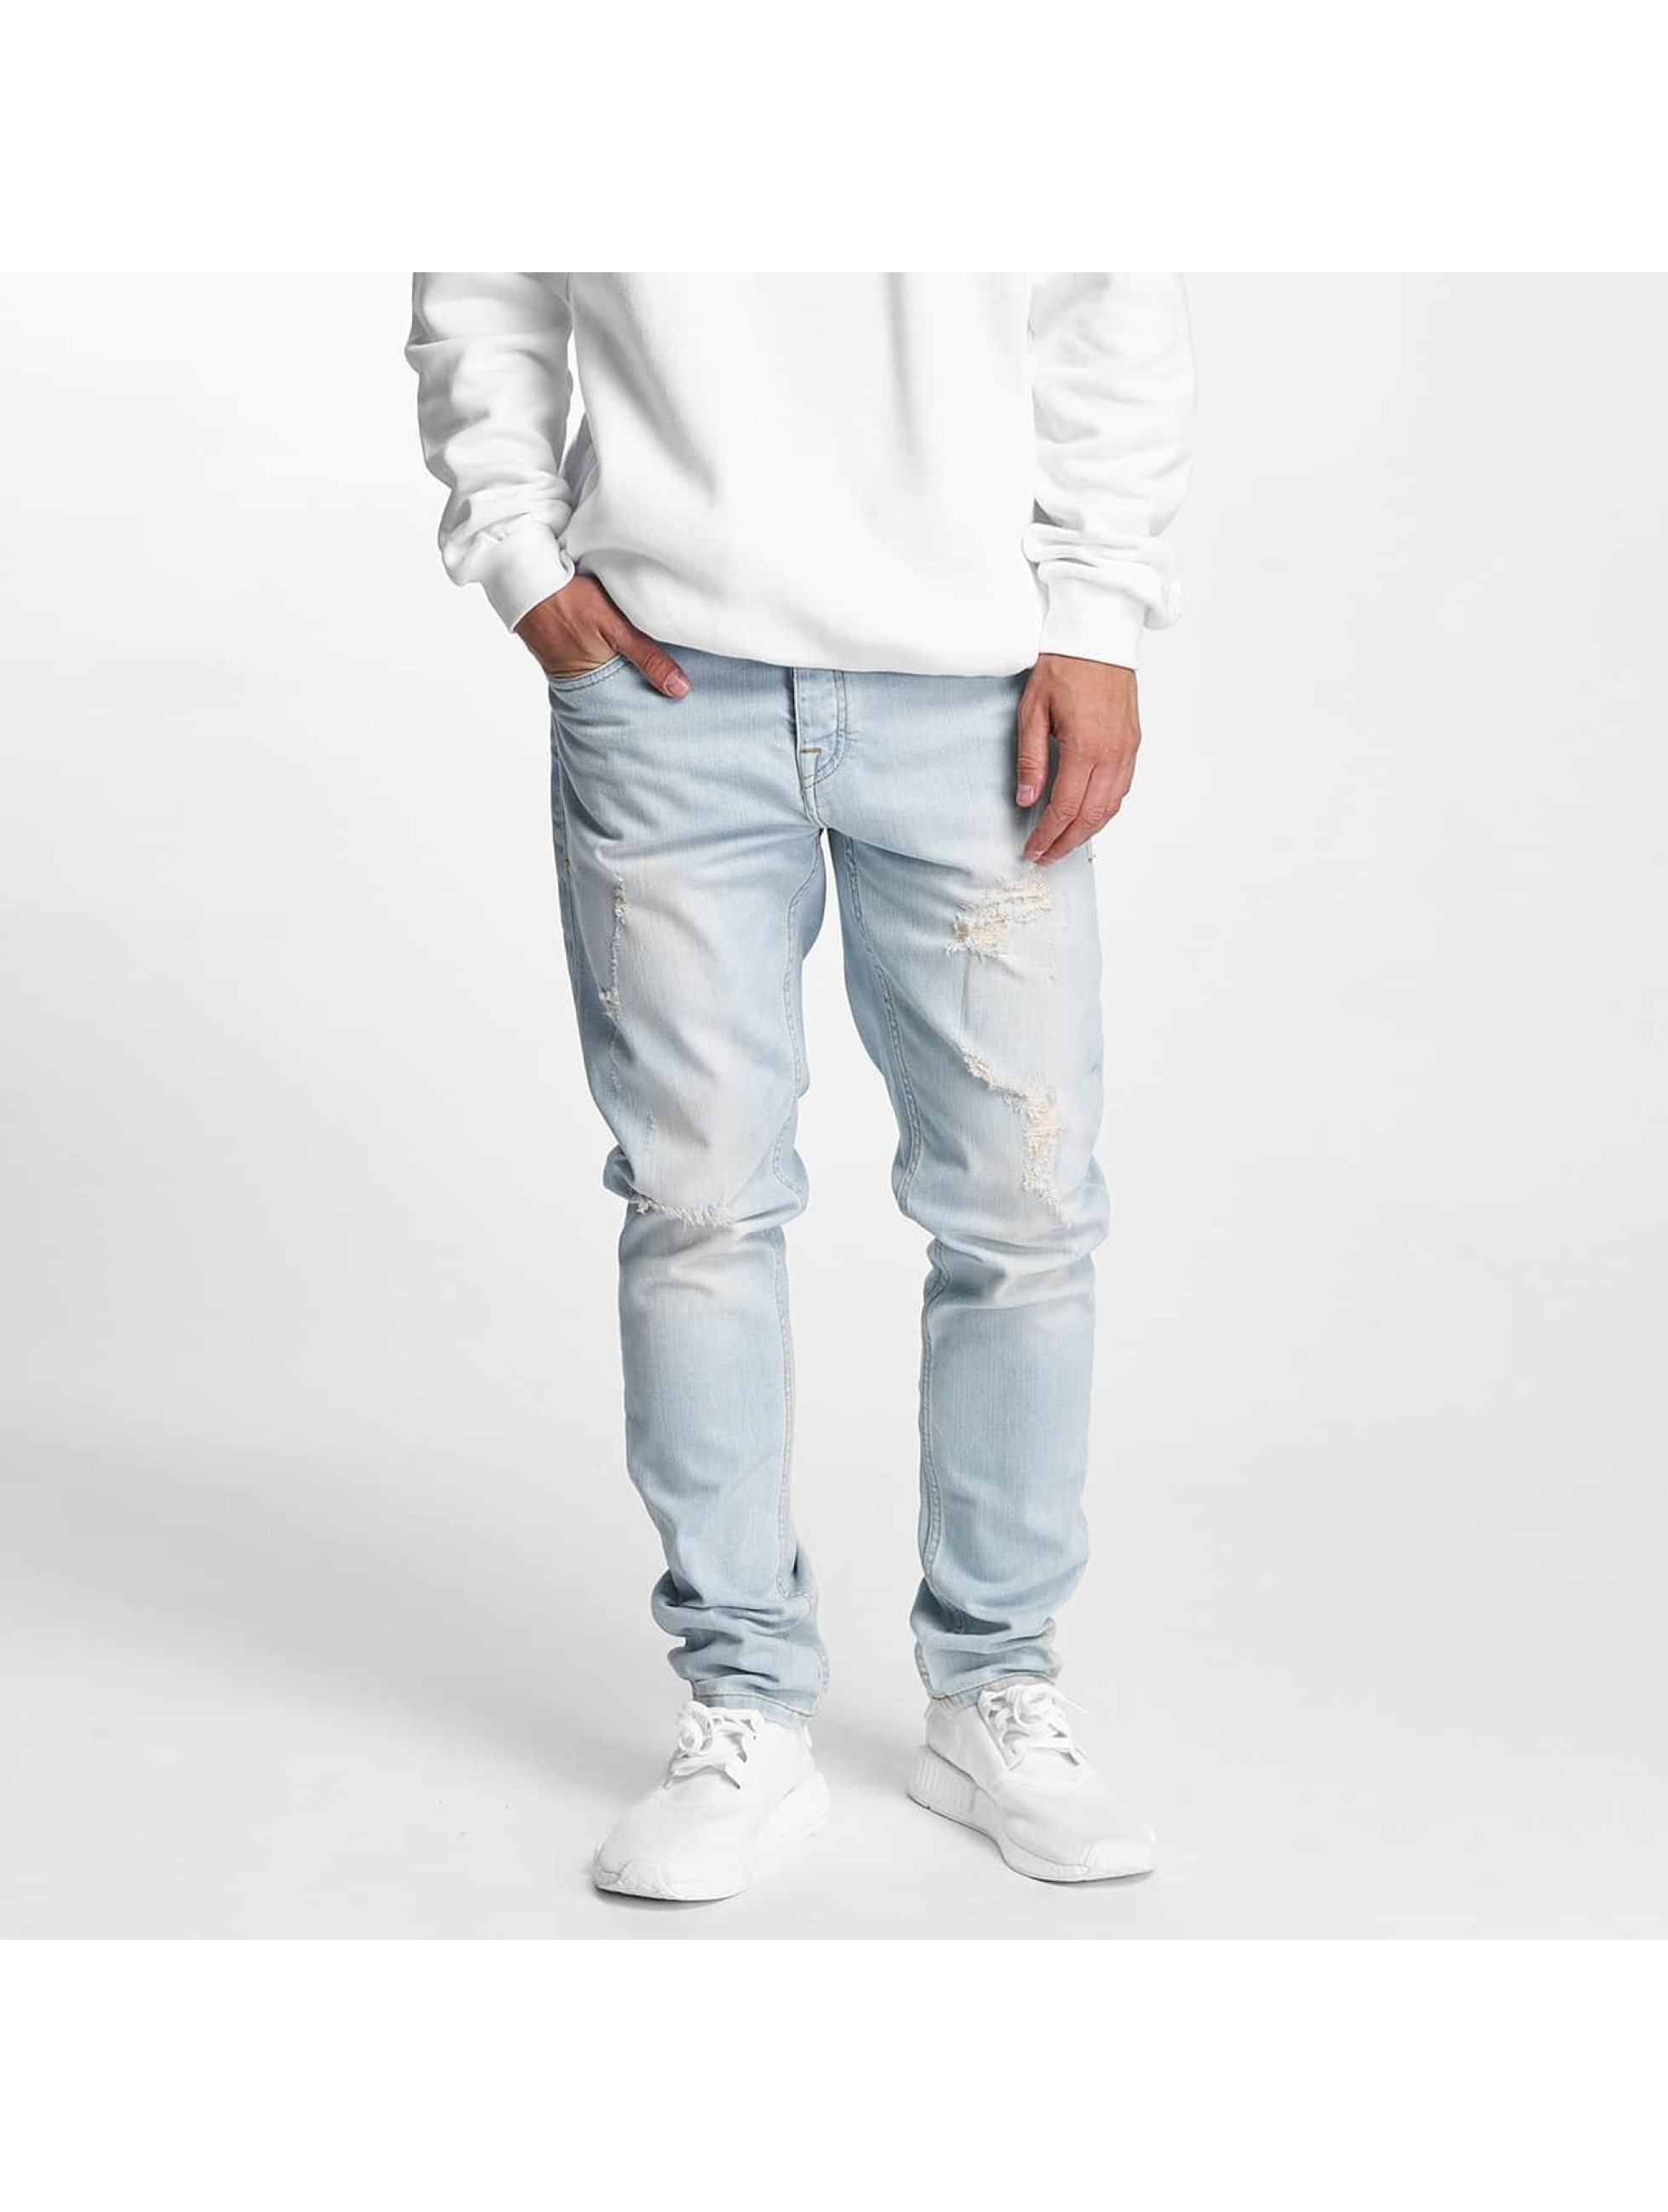 Pelle Pelle Männer Slim Fit Jeans Scotty Denim in blau